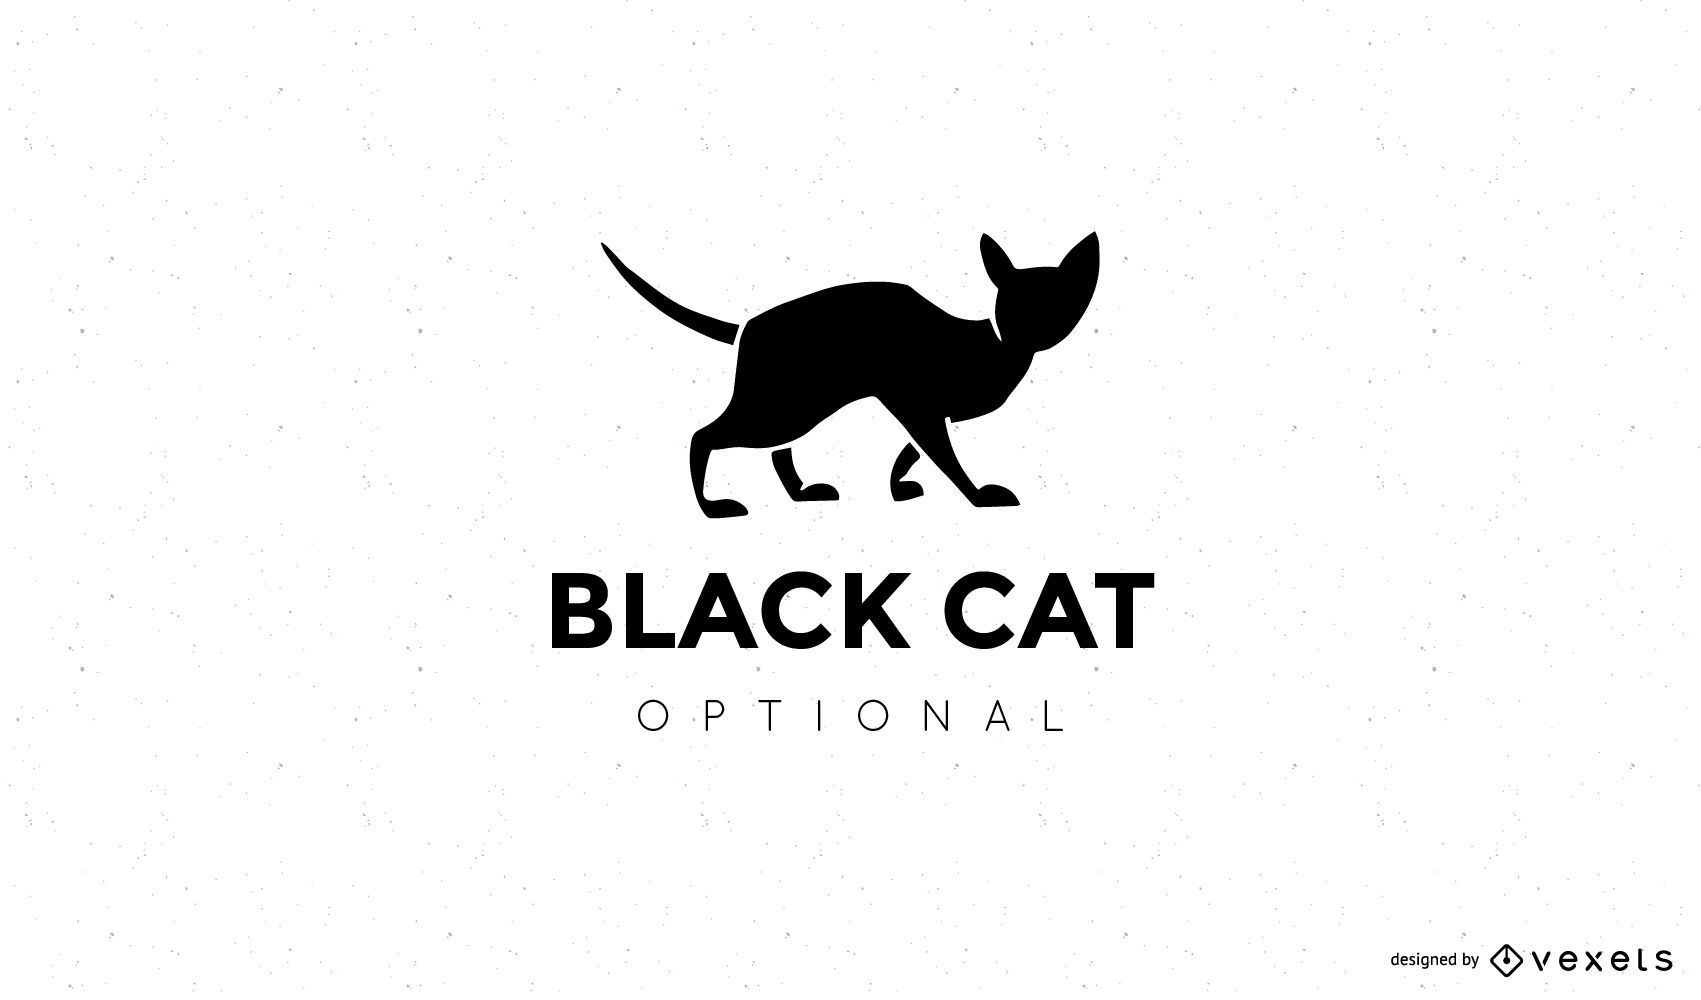 Diseño de logotipo de silueta de gato negro